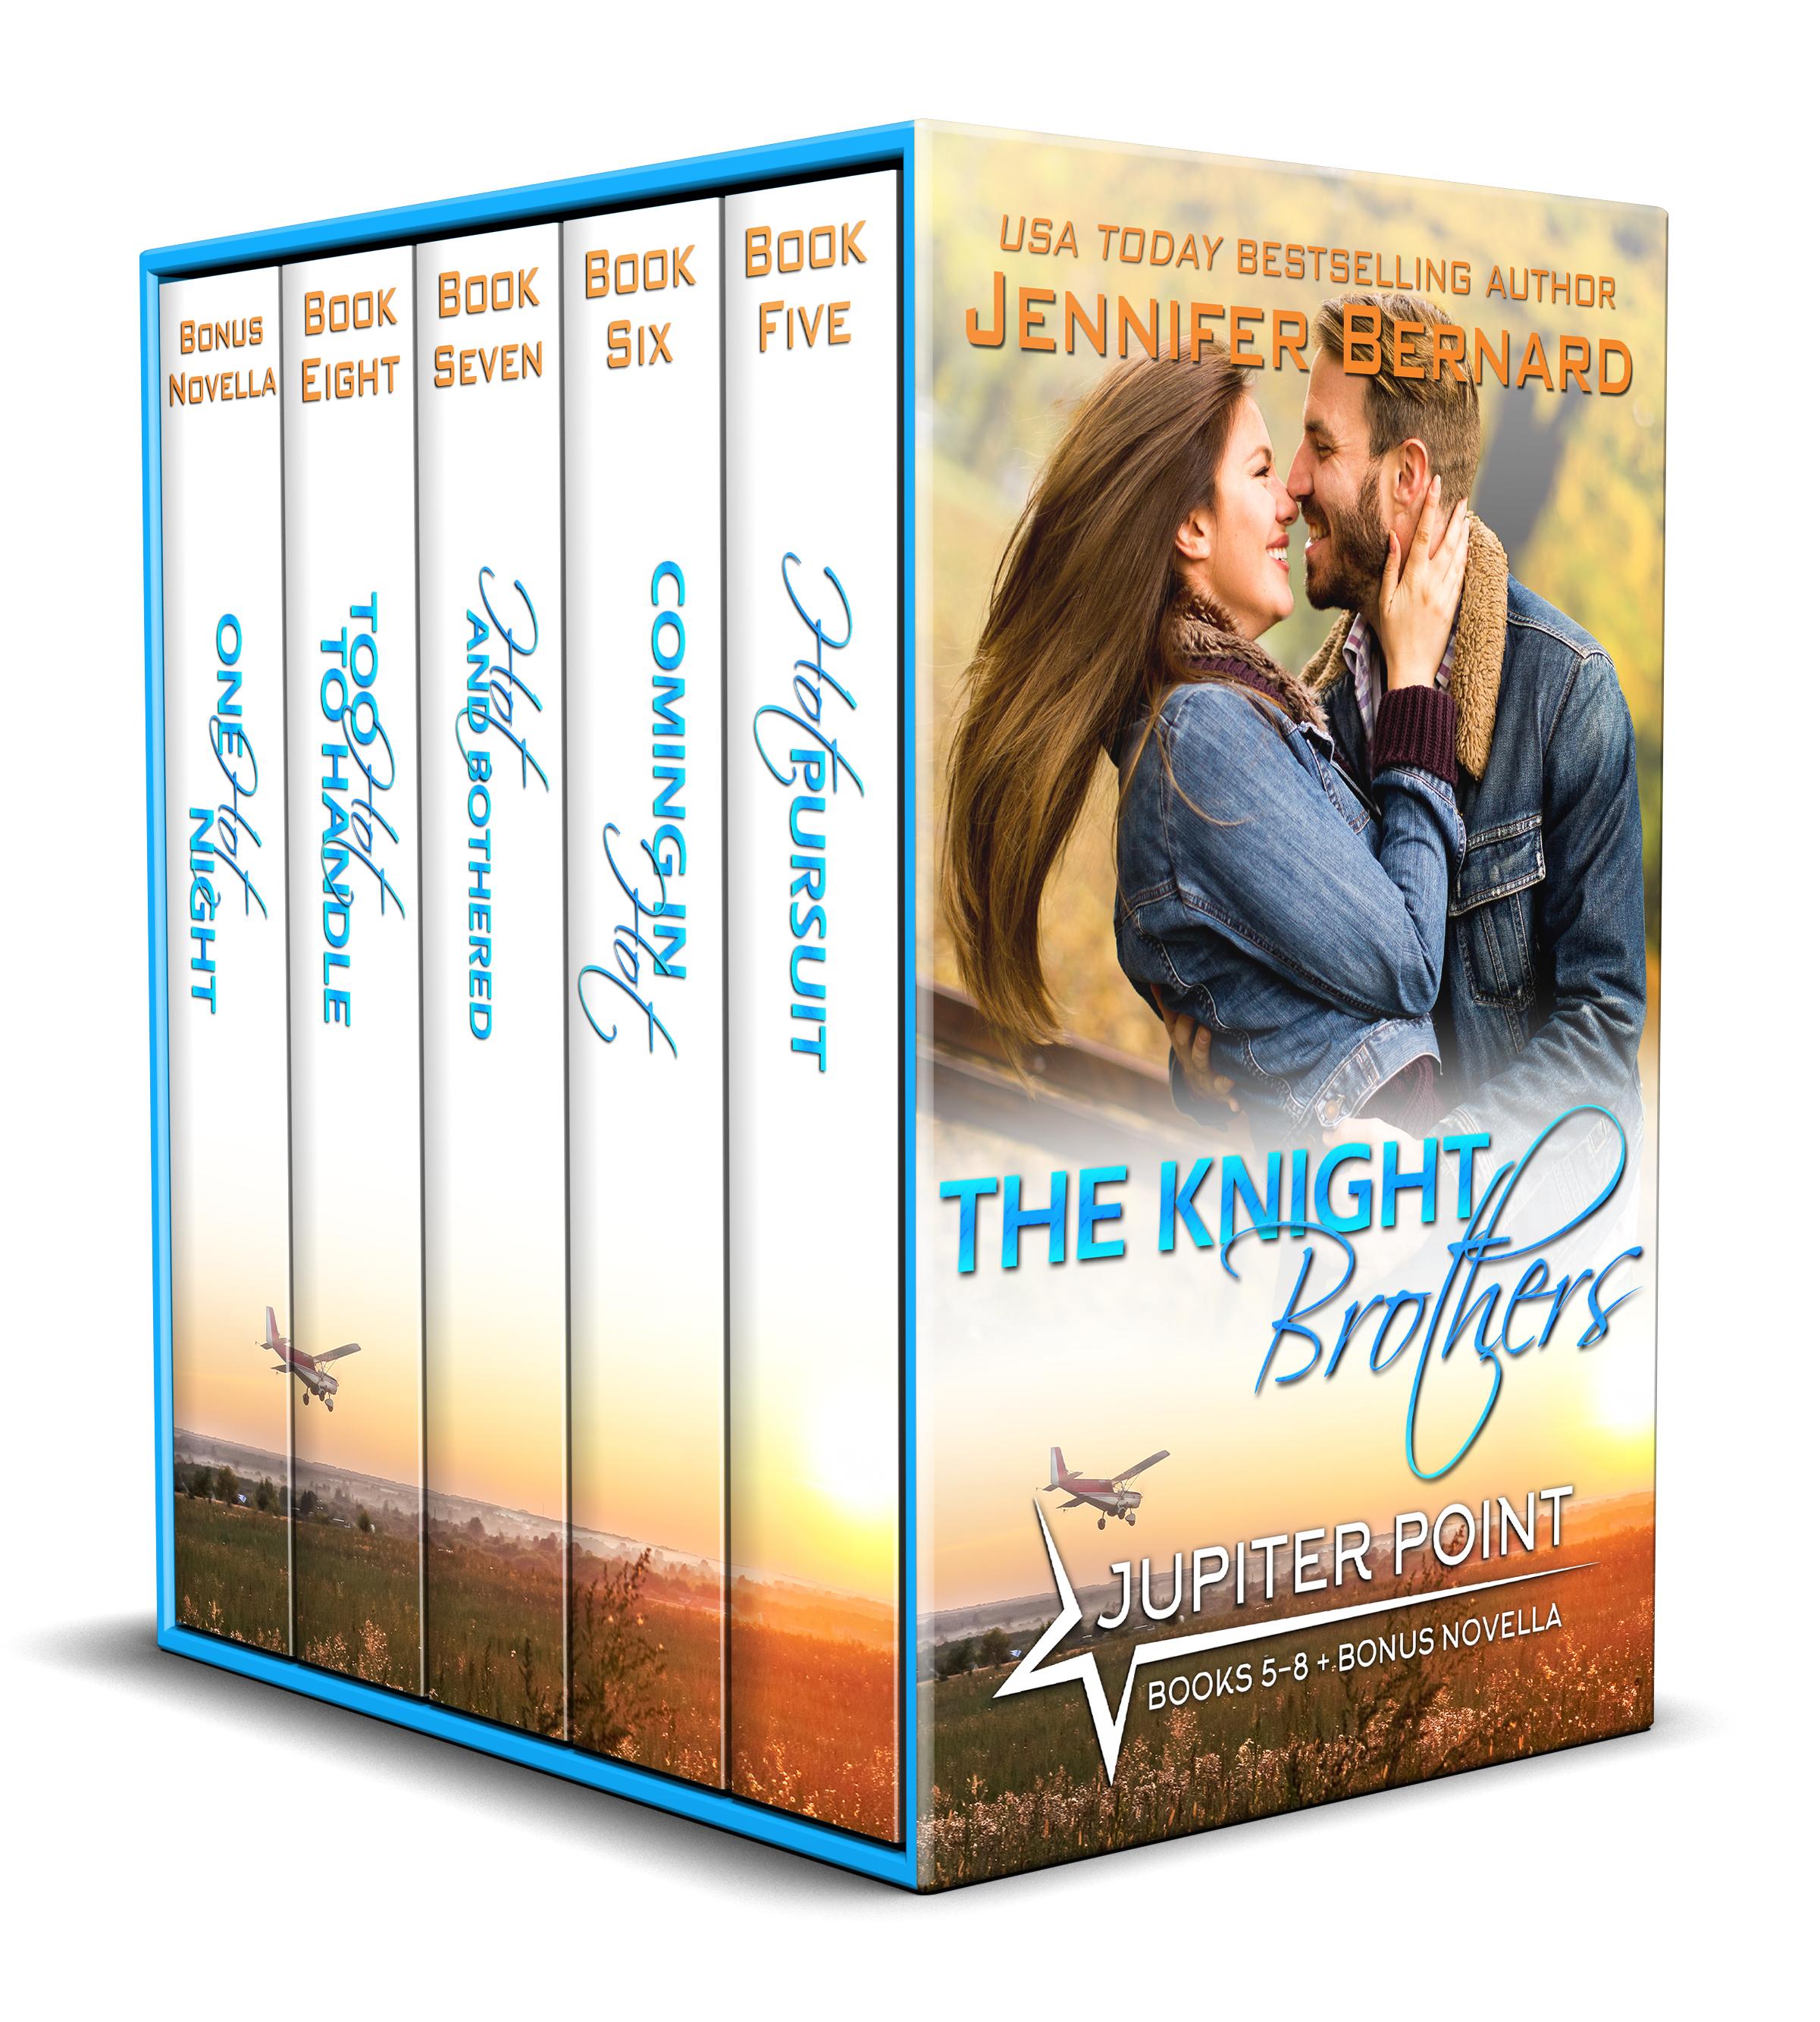 The Knight Brothers  3D boxed set 5-8 + Novella.jpg